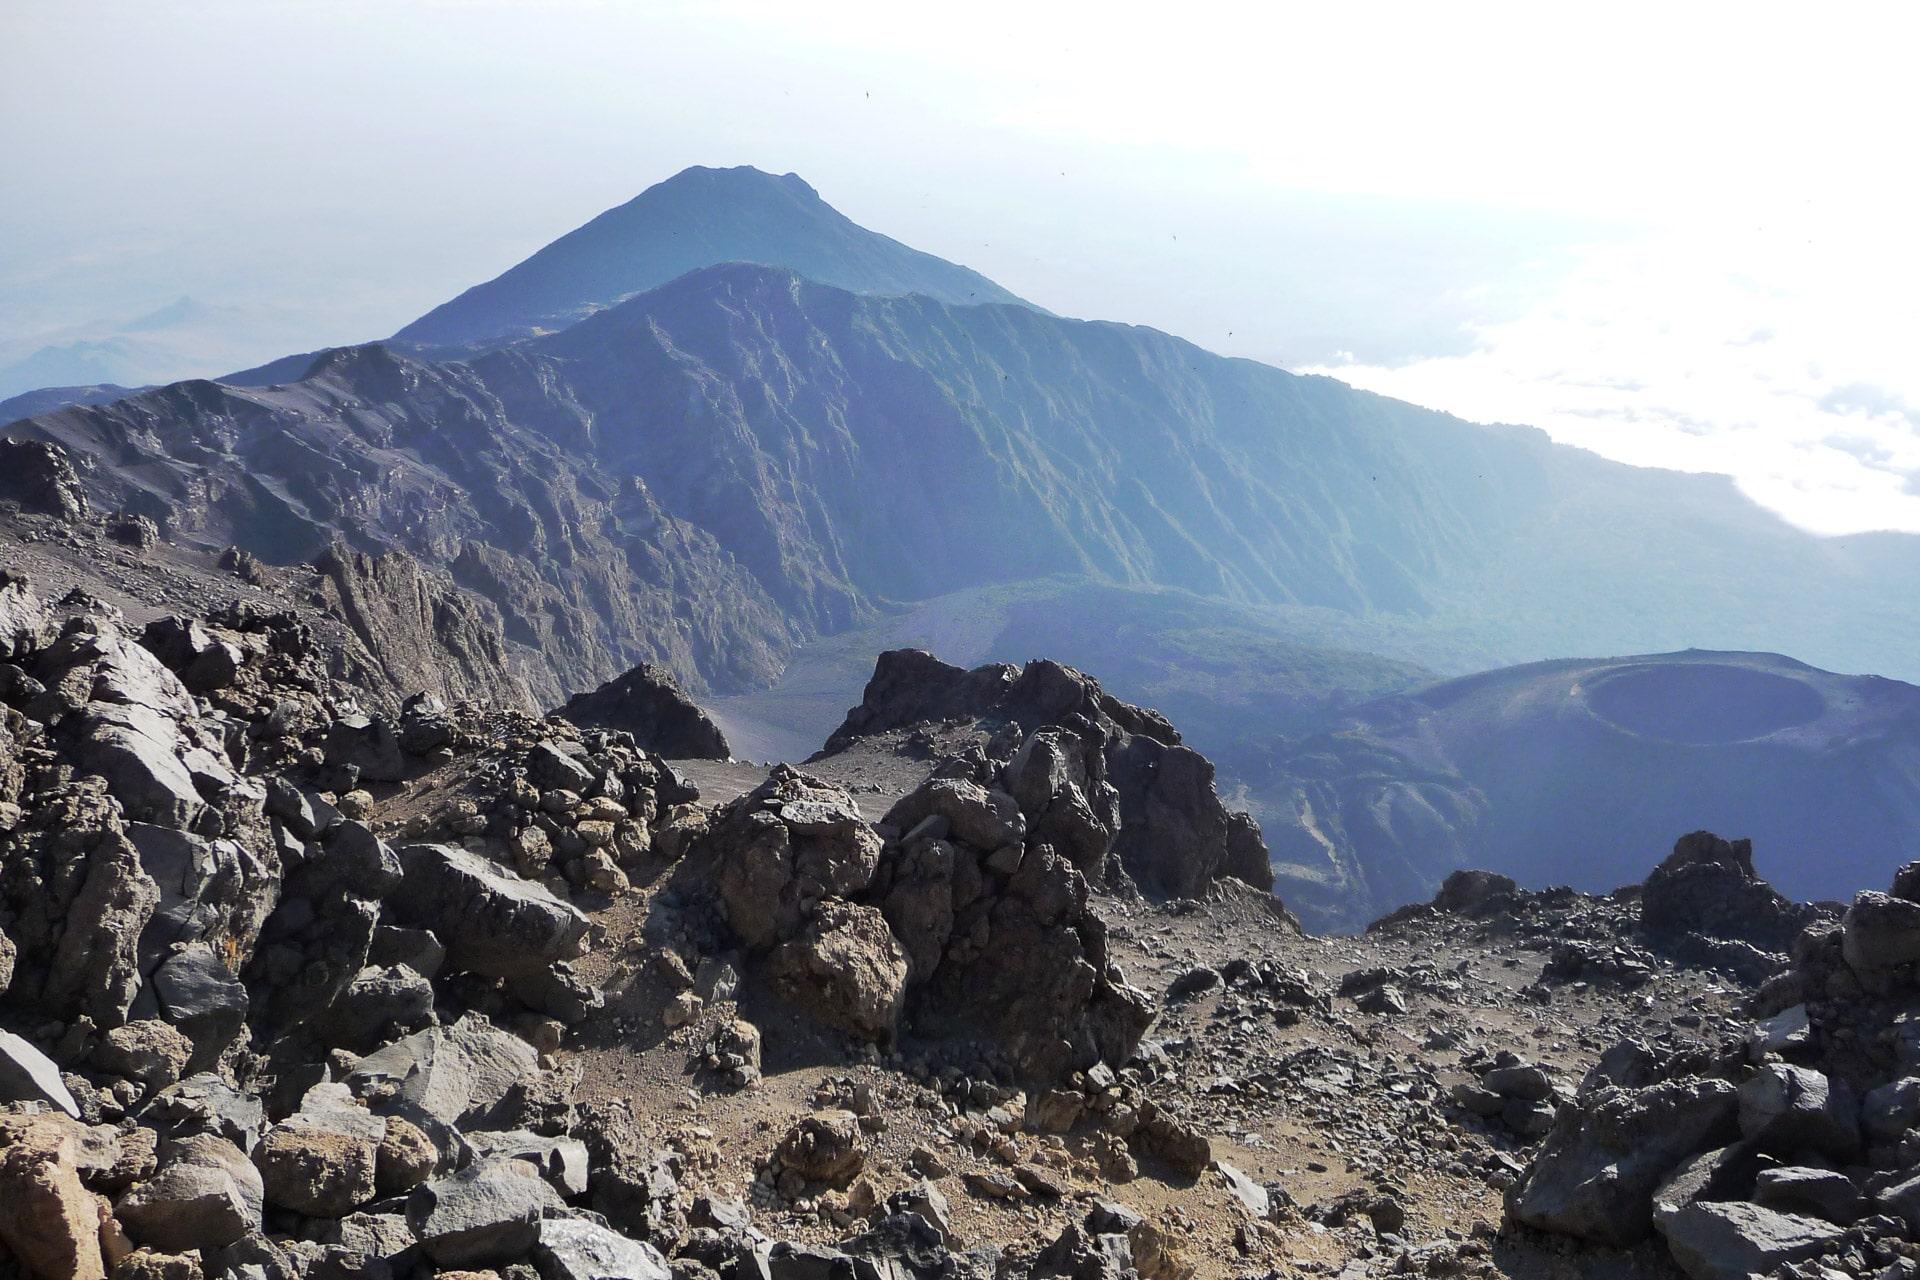 Mount-Meru-Arusha-Nationalpark-Tansania-Globetrotter-Select-Boehm-42